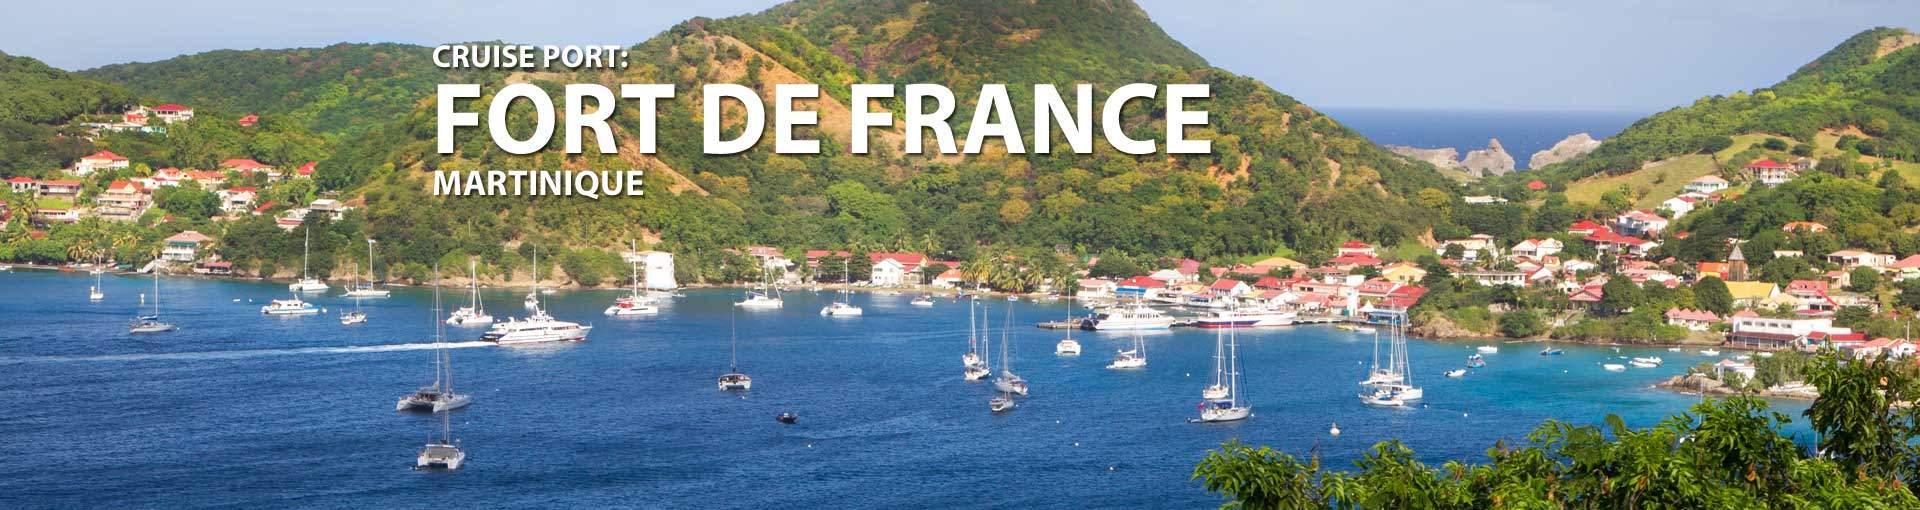 Cruises to Fort de France, Martinique